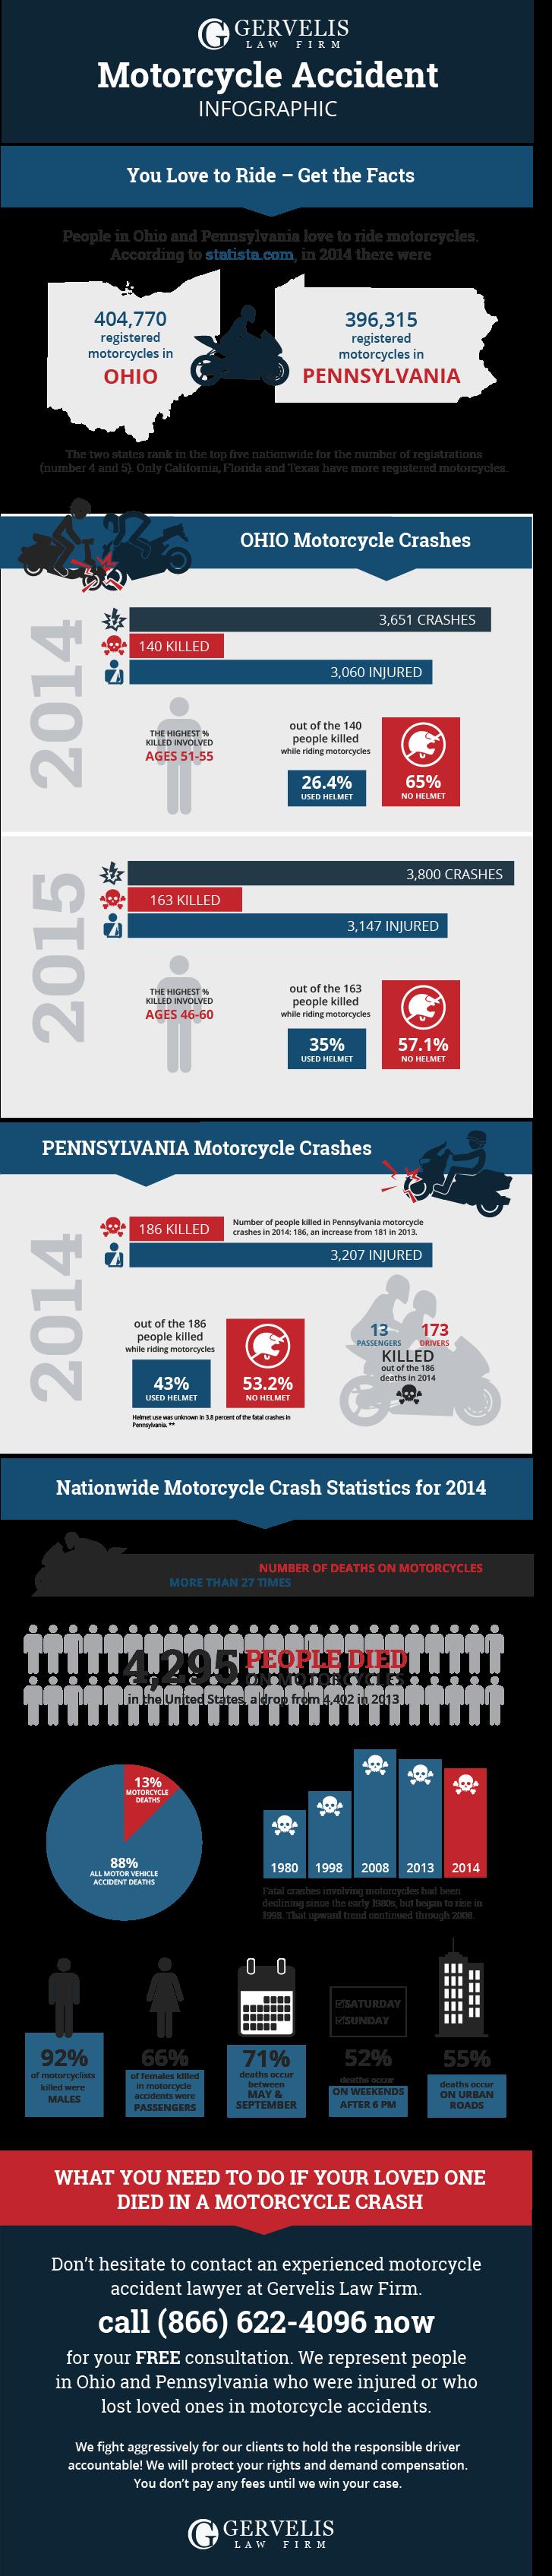 Ohio Motorcycle Accident Attorney Infographic